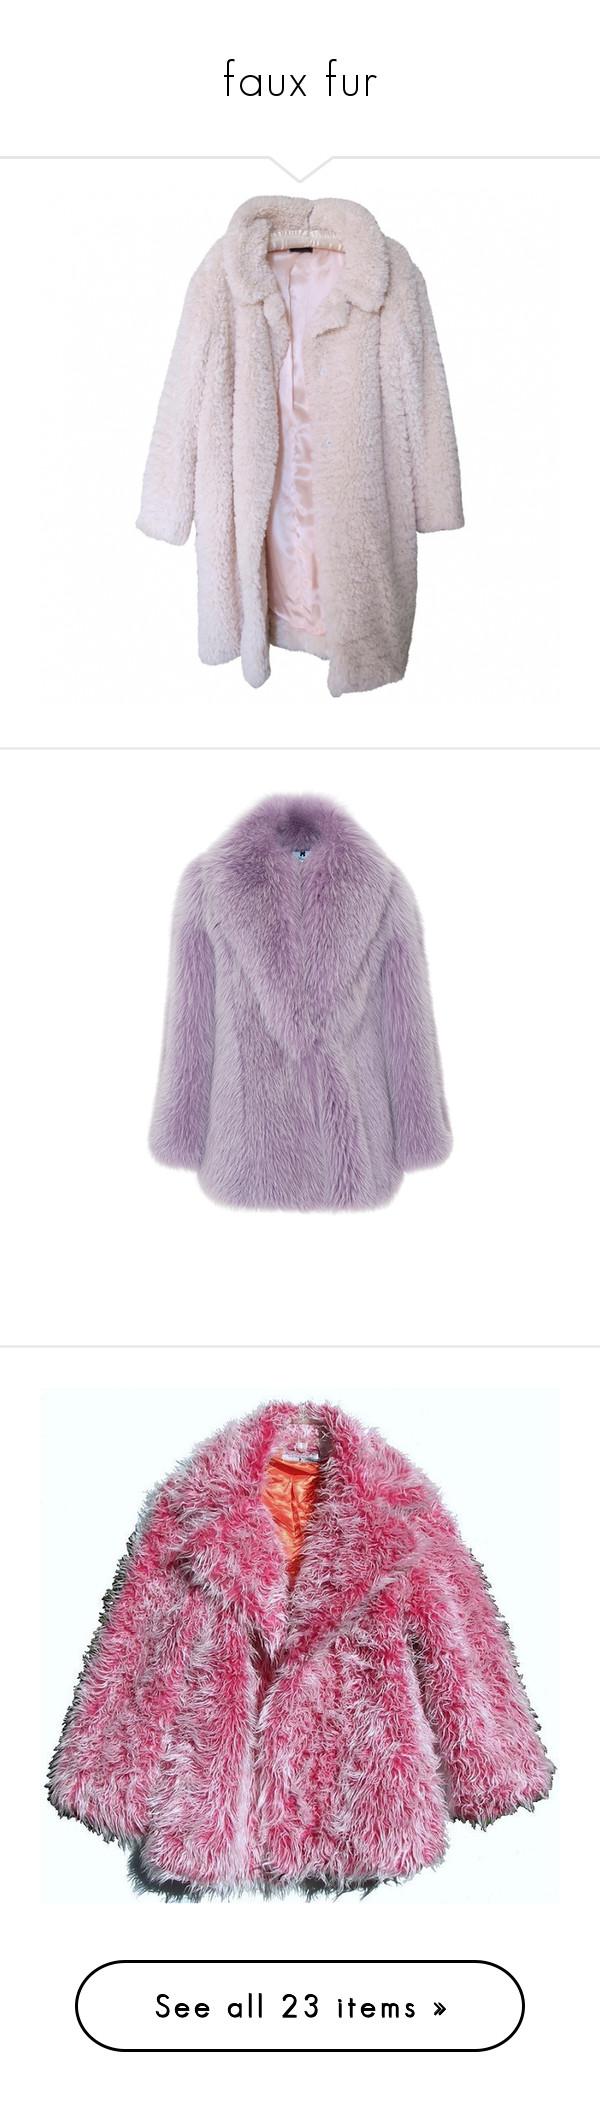 """faux fur"" by yourlocalhuman ❤ liked on Polyvore featuring outerwear, coats, tops, jackets, imitation fur coats, nina ricci coat, oversized coat, nina ricci, pink oversized coat and shawl collar coat"